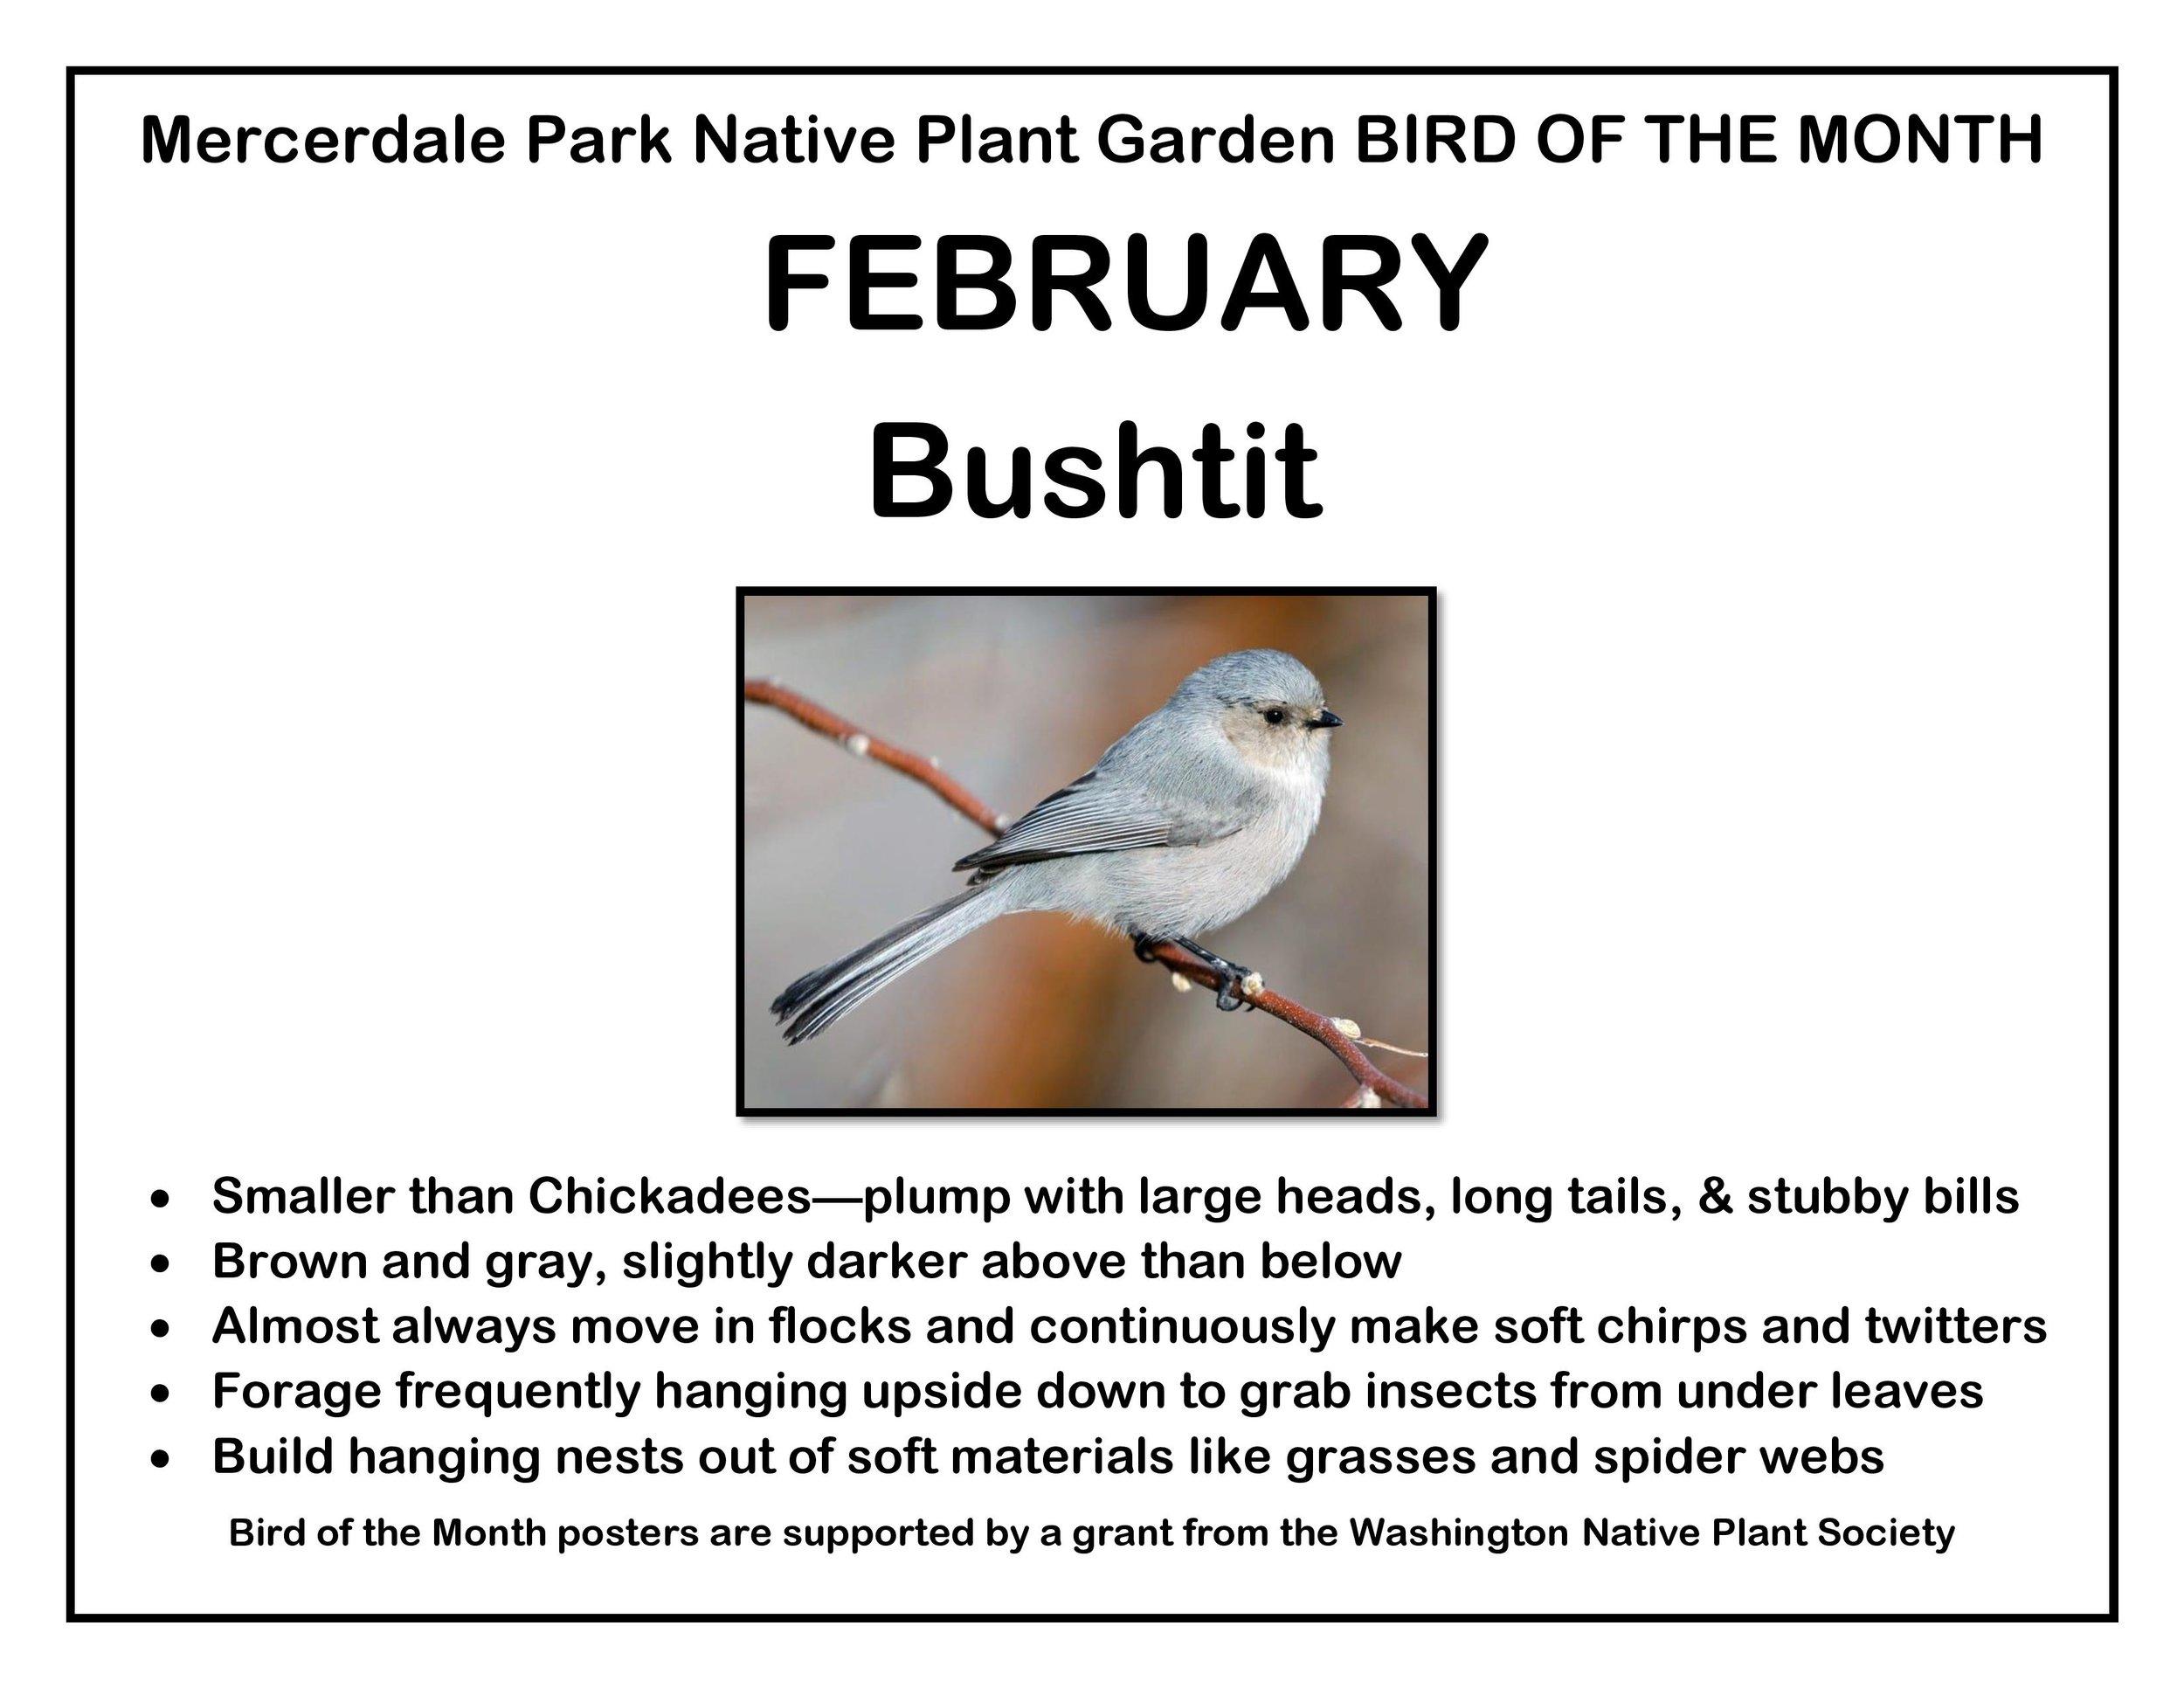 p BIRD OF THE MONTH 2 February Bushtit v2-page-001.jpg